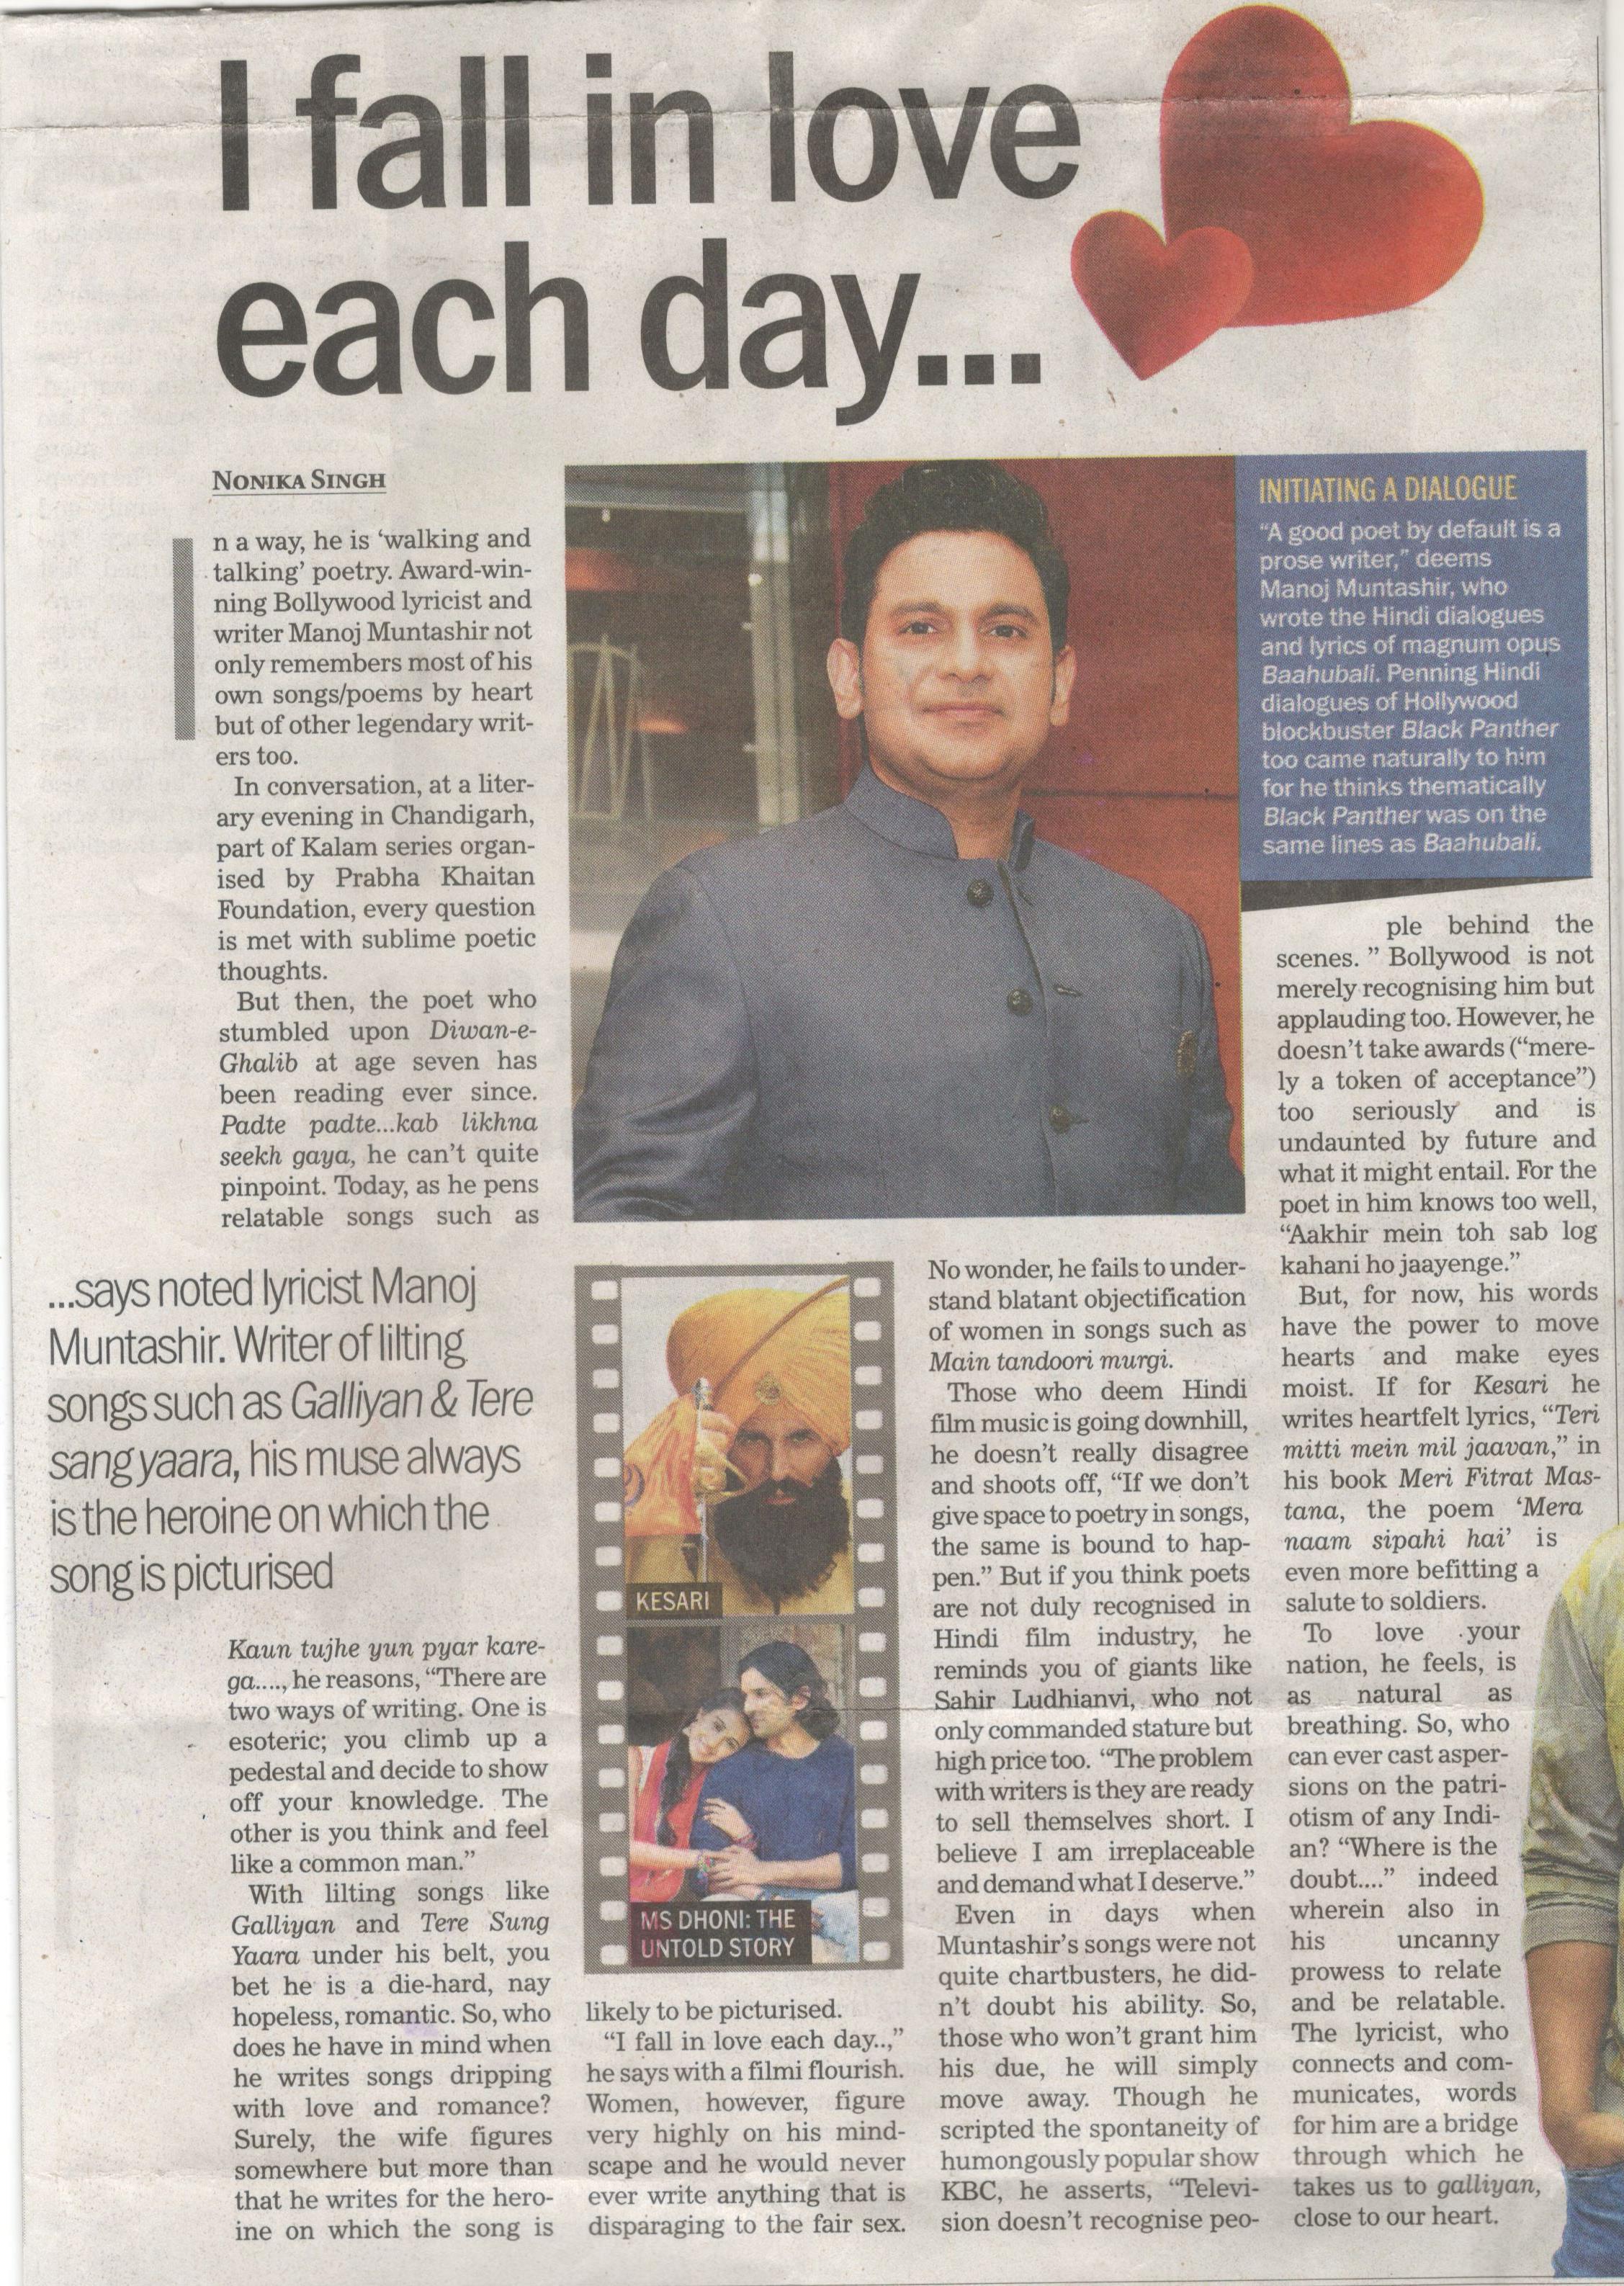 Kalam Chandigarh-Manoj Muntashir (Tribune LifeStyle)